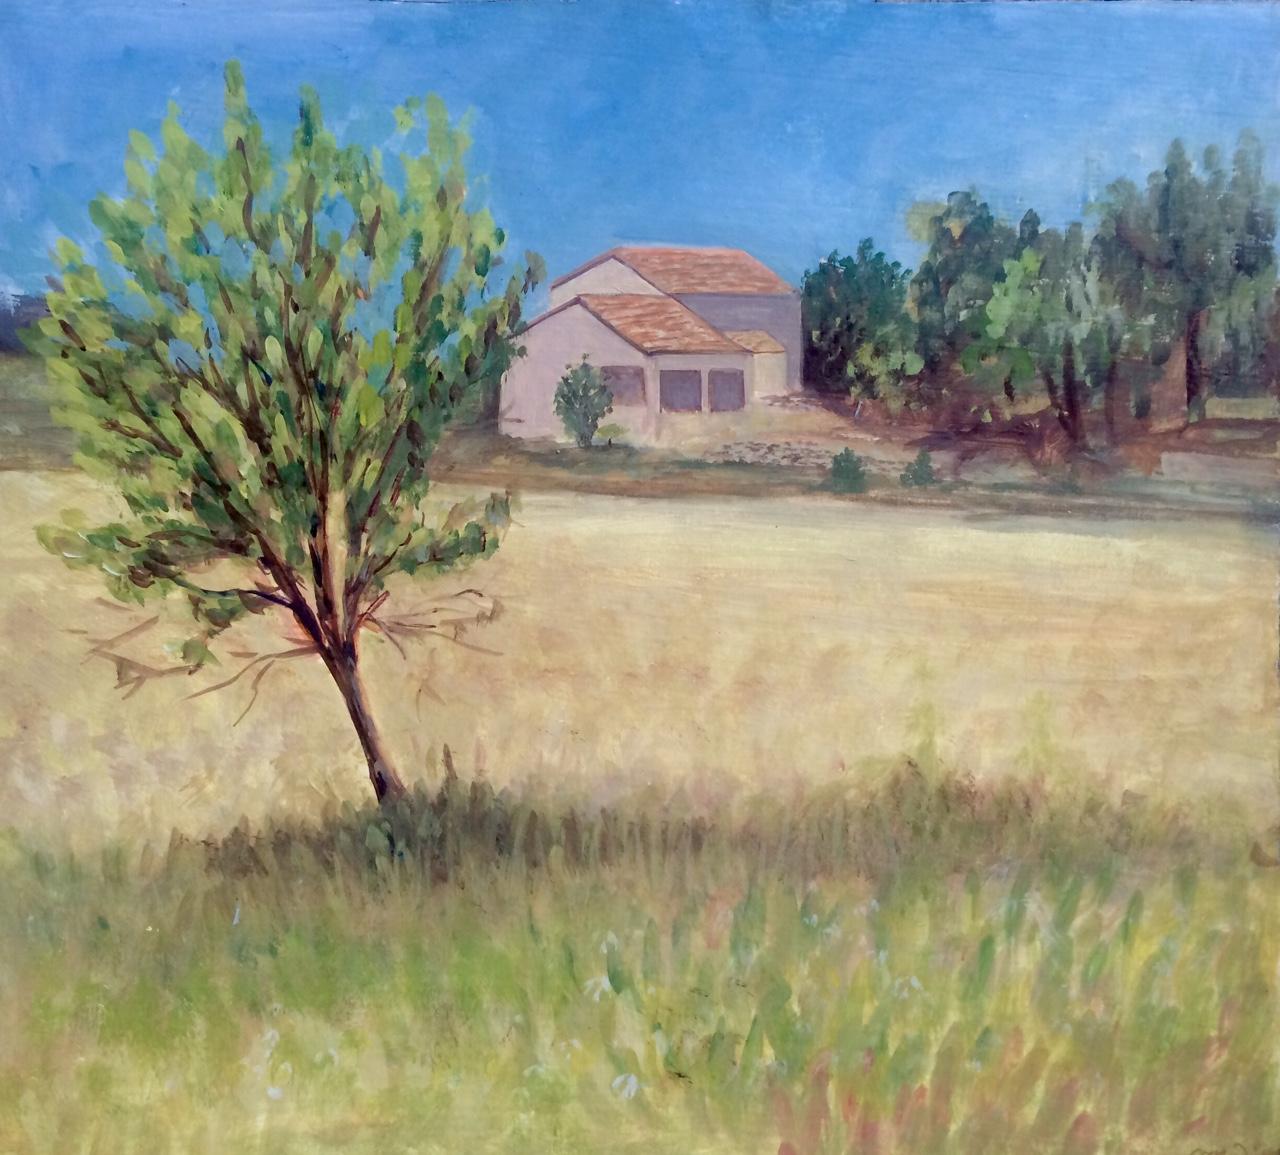 Landscape with Tree   2015. Oil on gessoed cardboard.